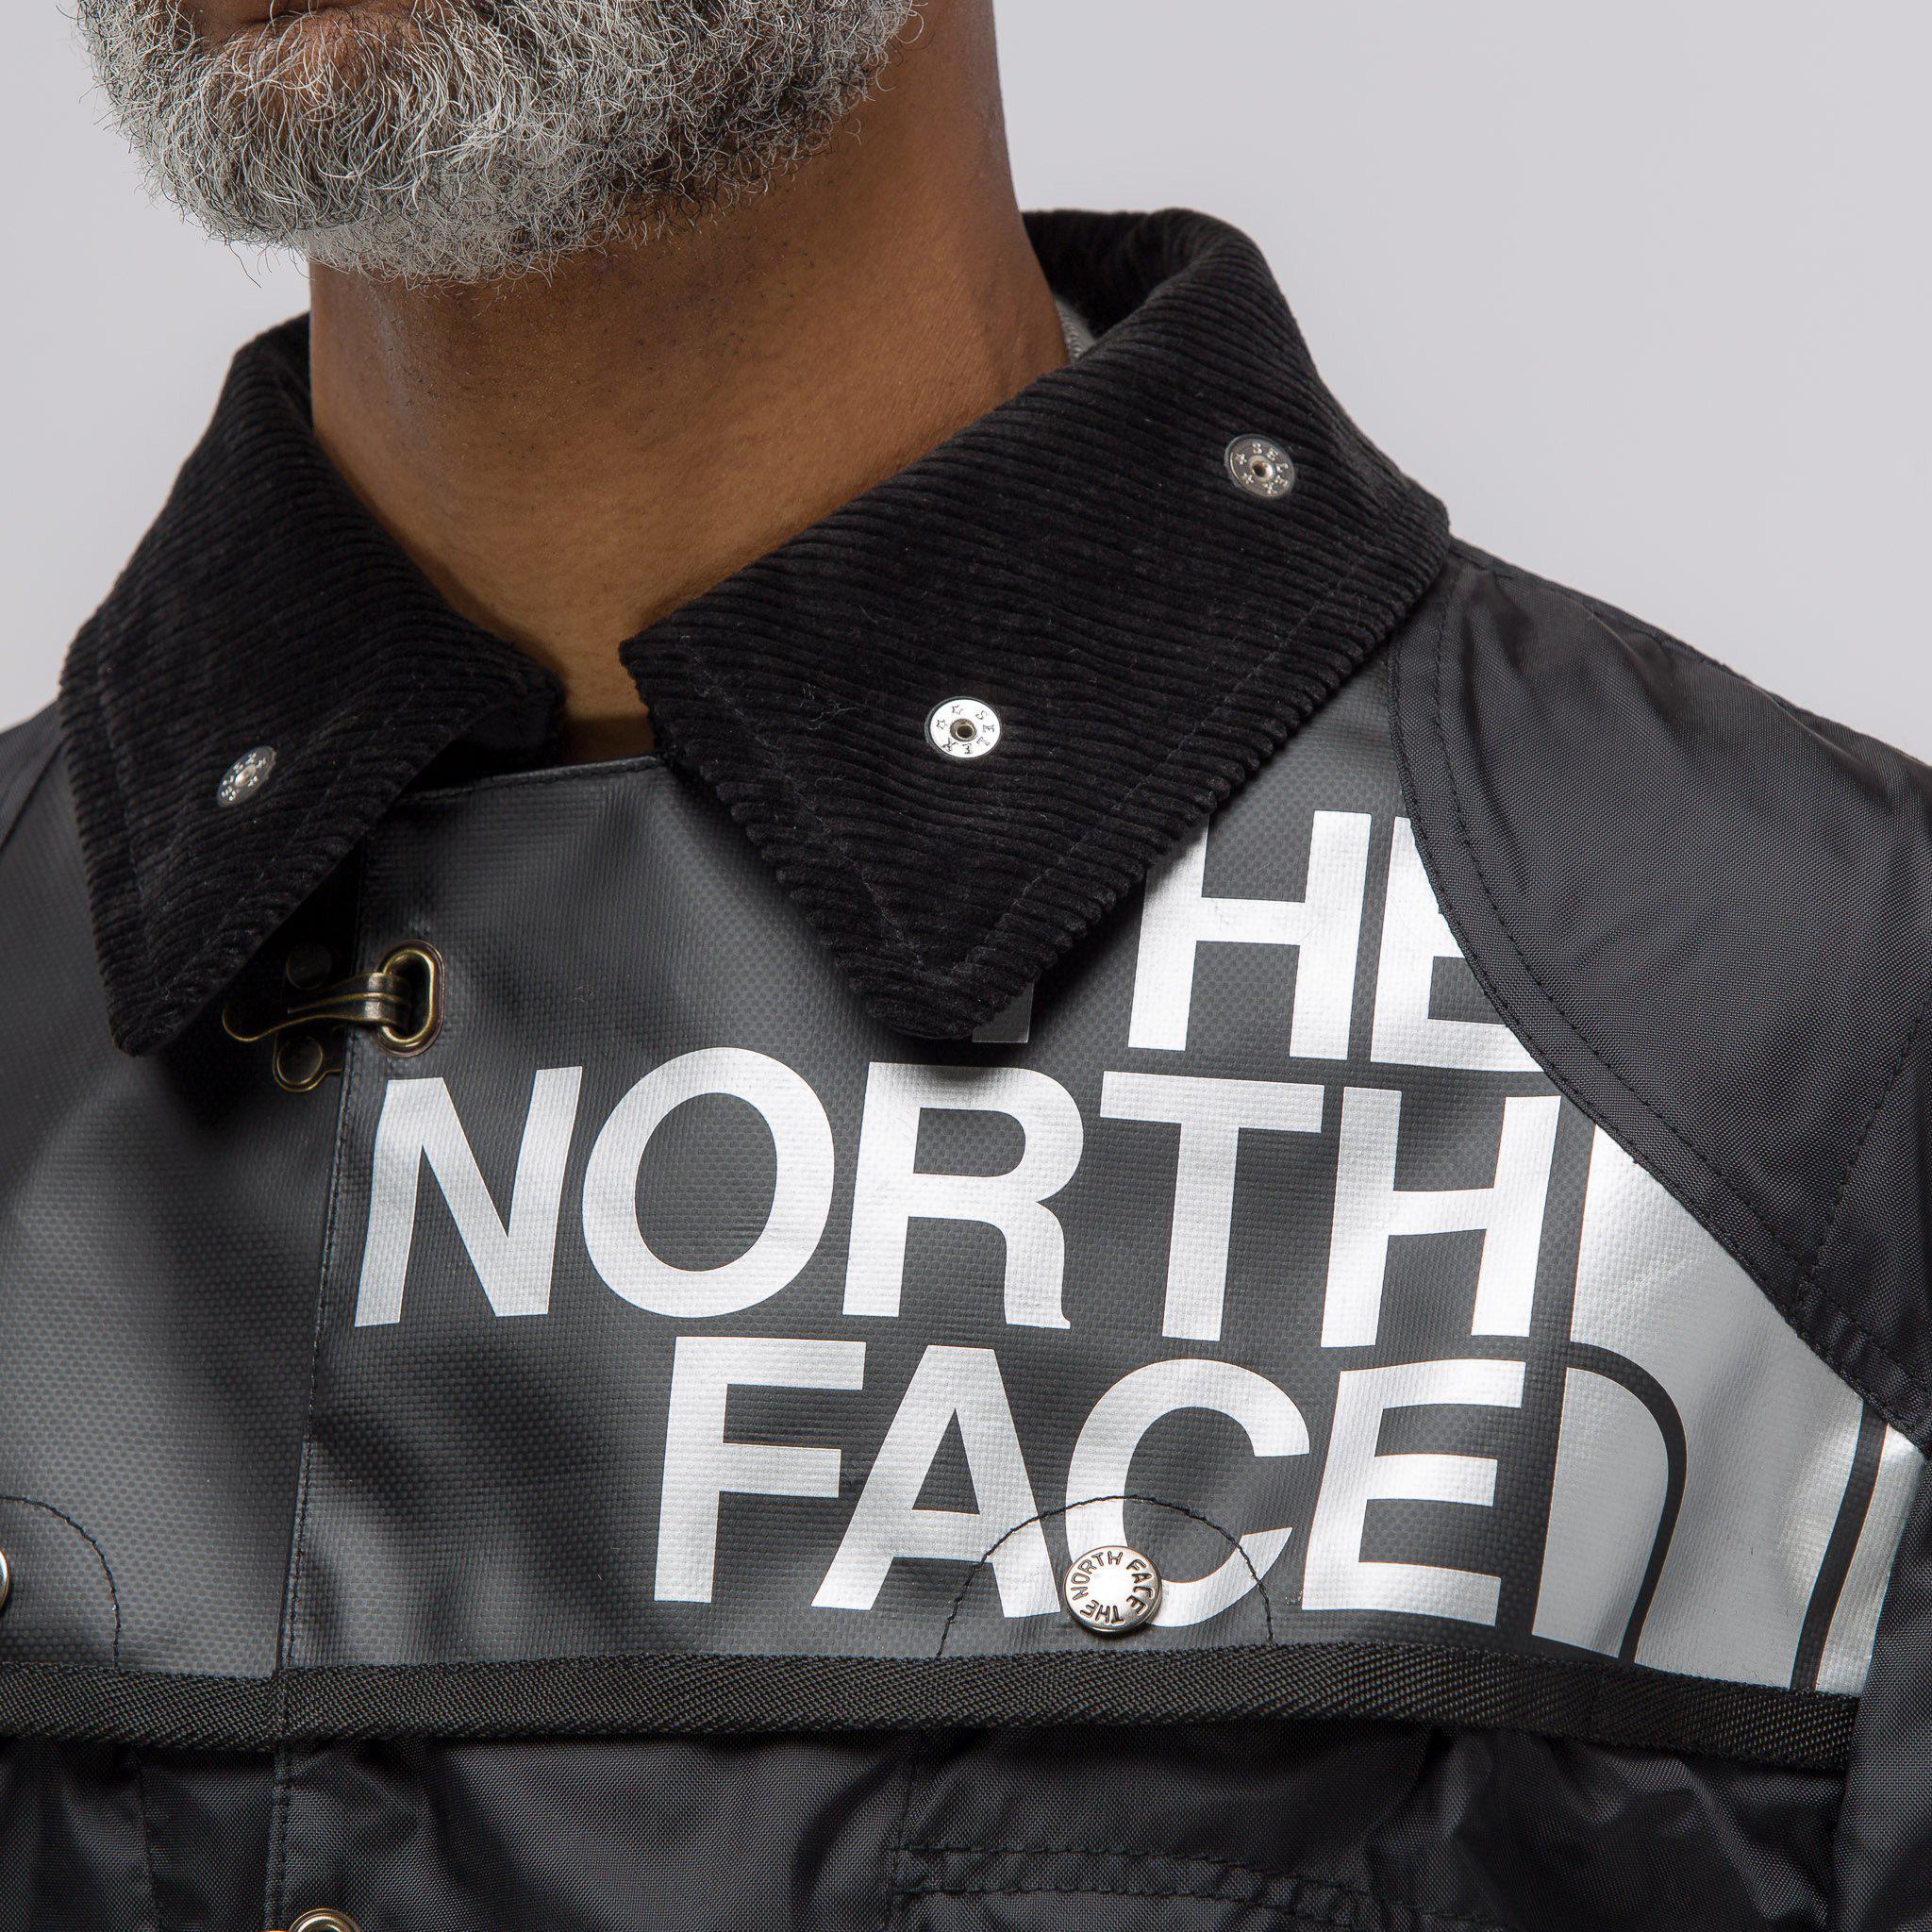 93f0b6d634 Lyst - Junya Watanabe X The North Face Buckle Duffle Bag Coat In ...